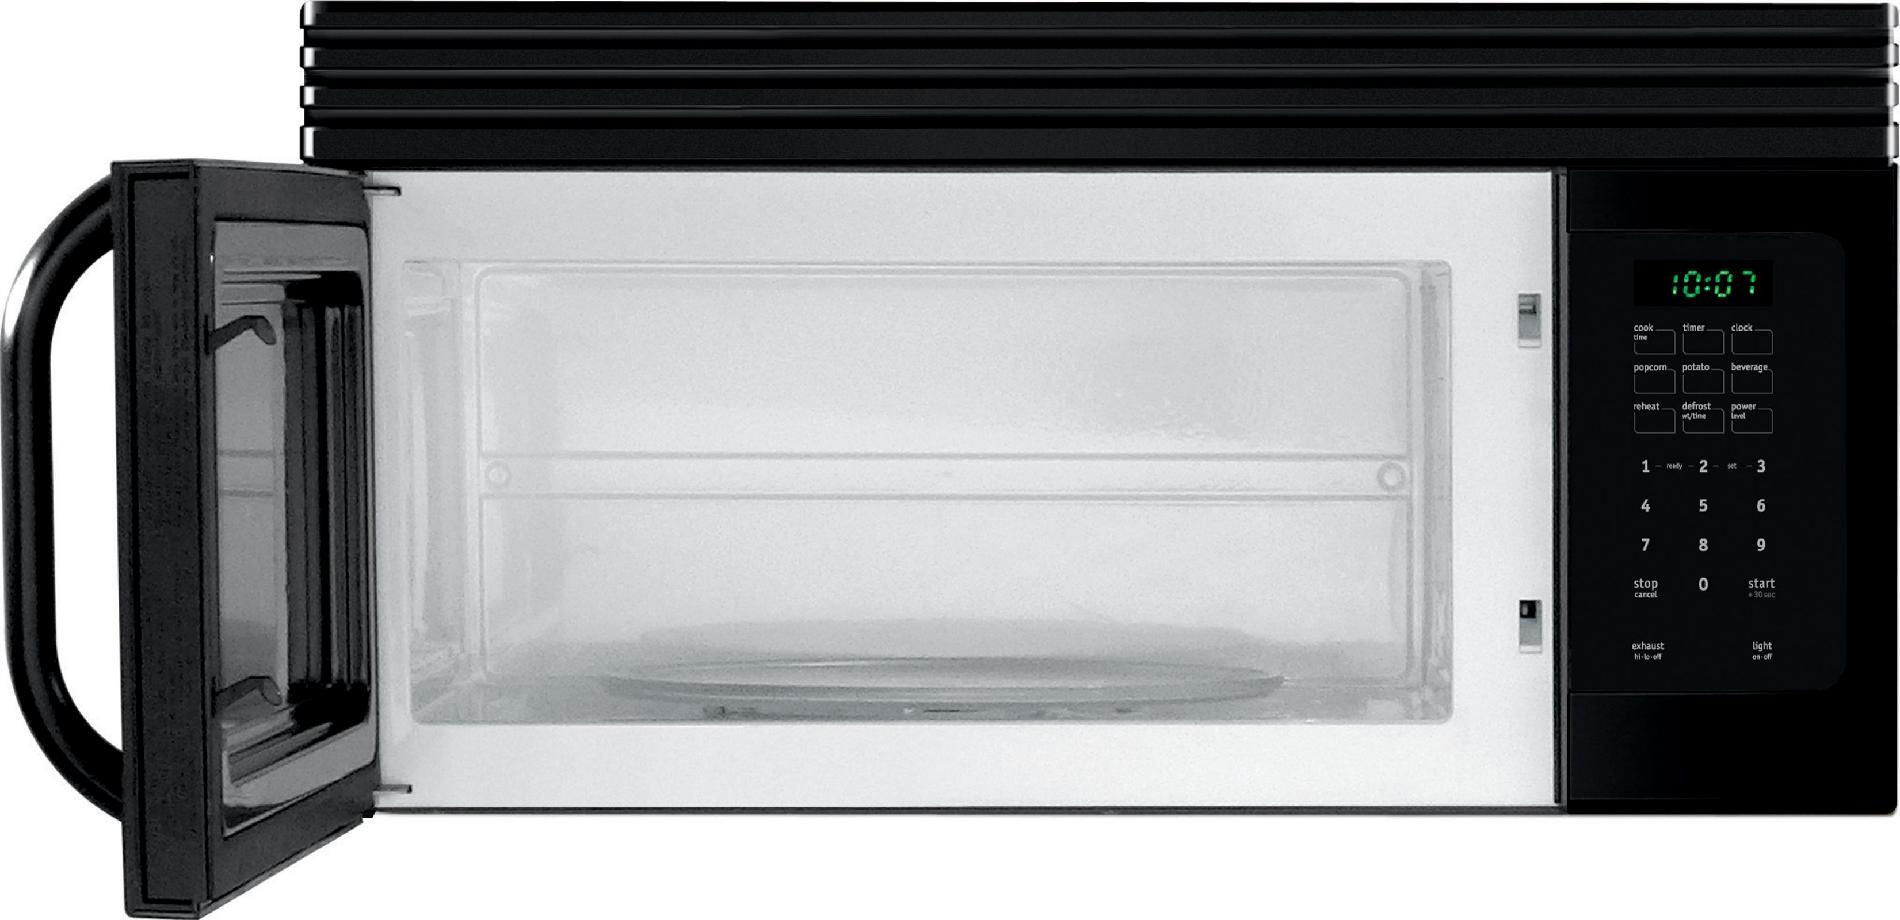 Frigidaire 1.6 cu. ft. Over-the-Range Microwave Oven - Black